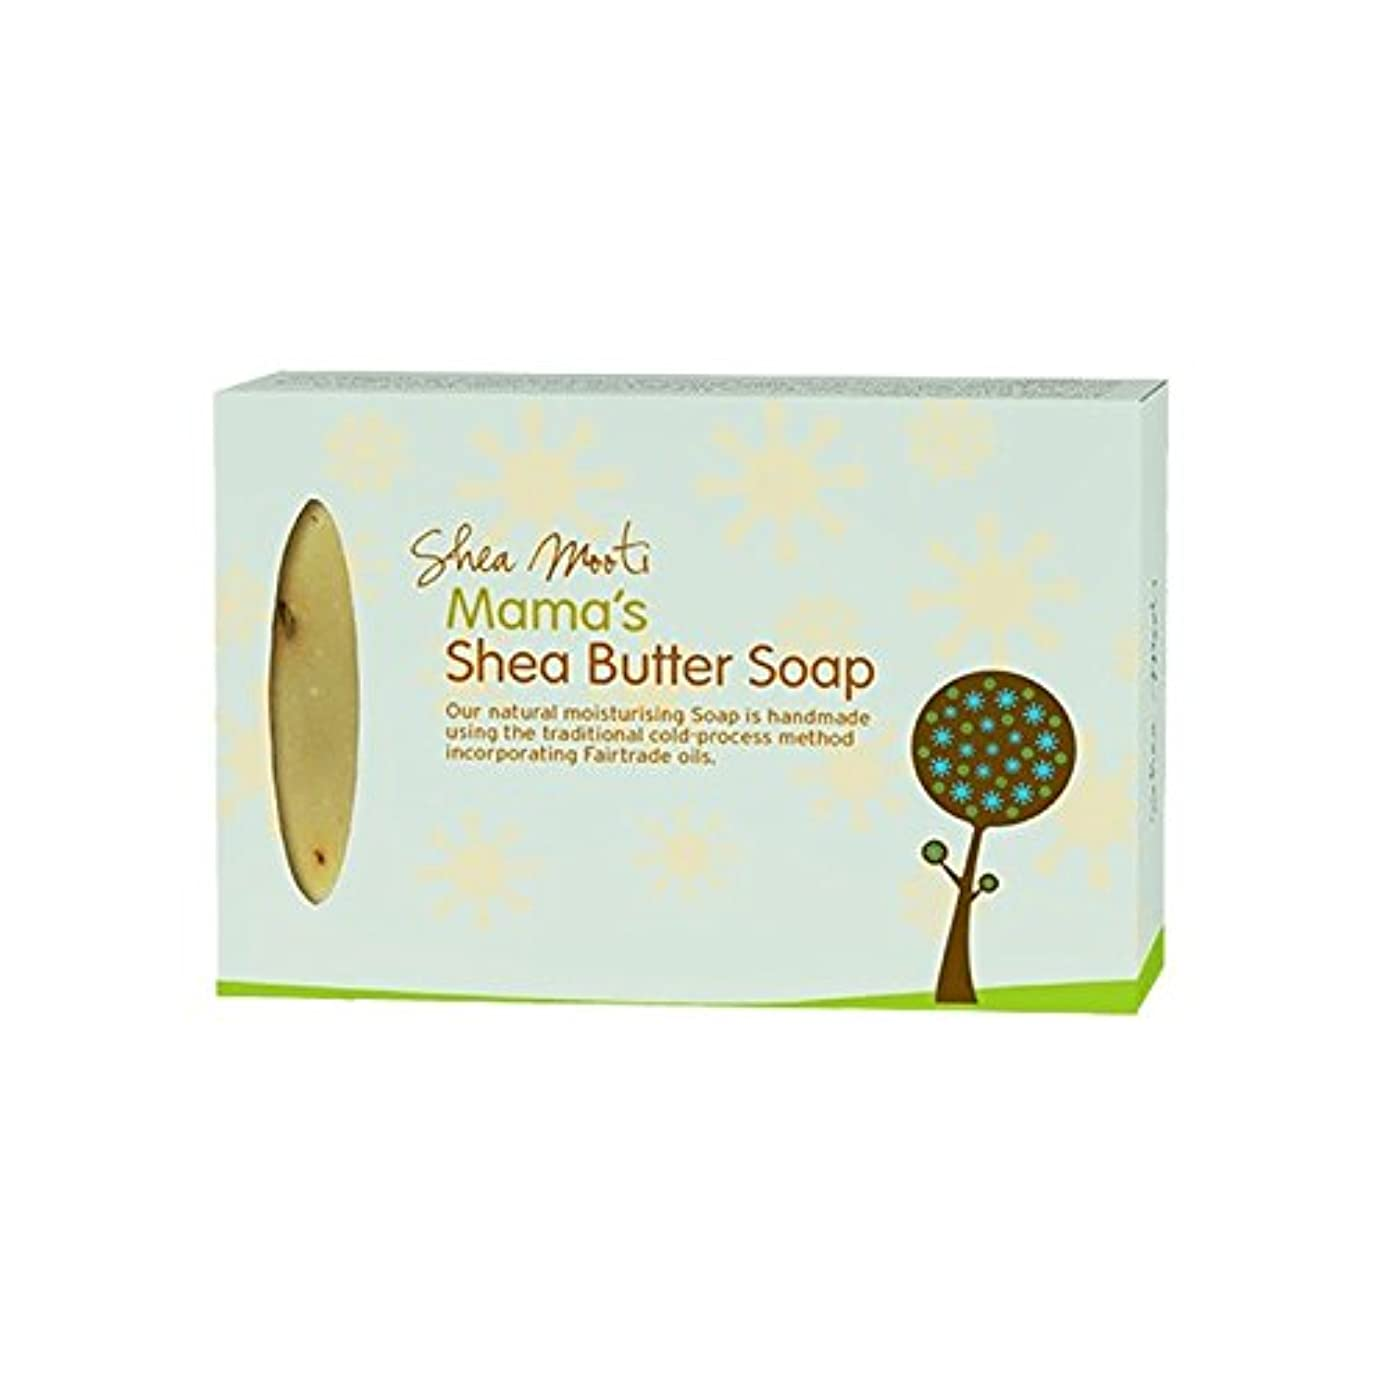 Shea Mooti Mama's Shea Butter Soap 100g (Pack of 6) - シアバターMootiママのシアバターソープ100グラム (x6) [並行輸入品]